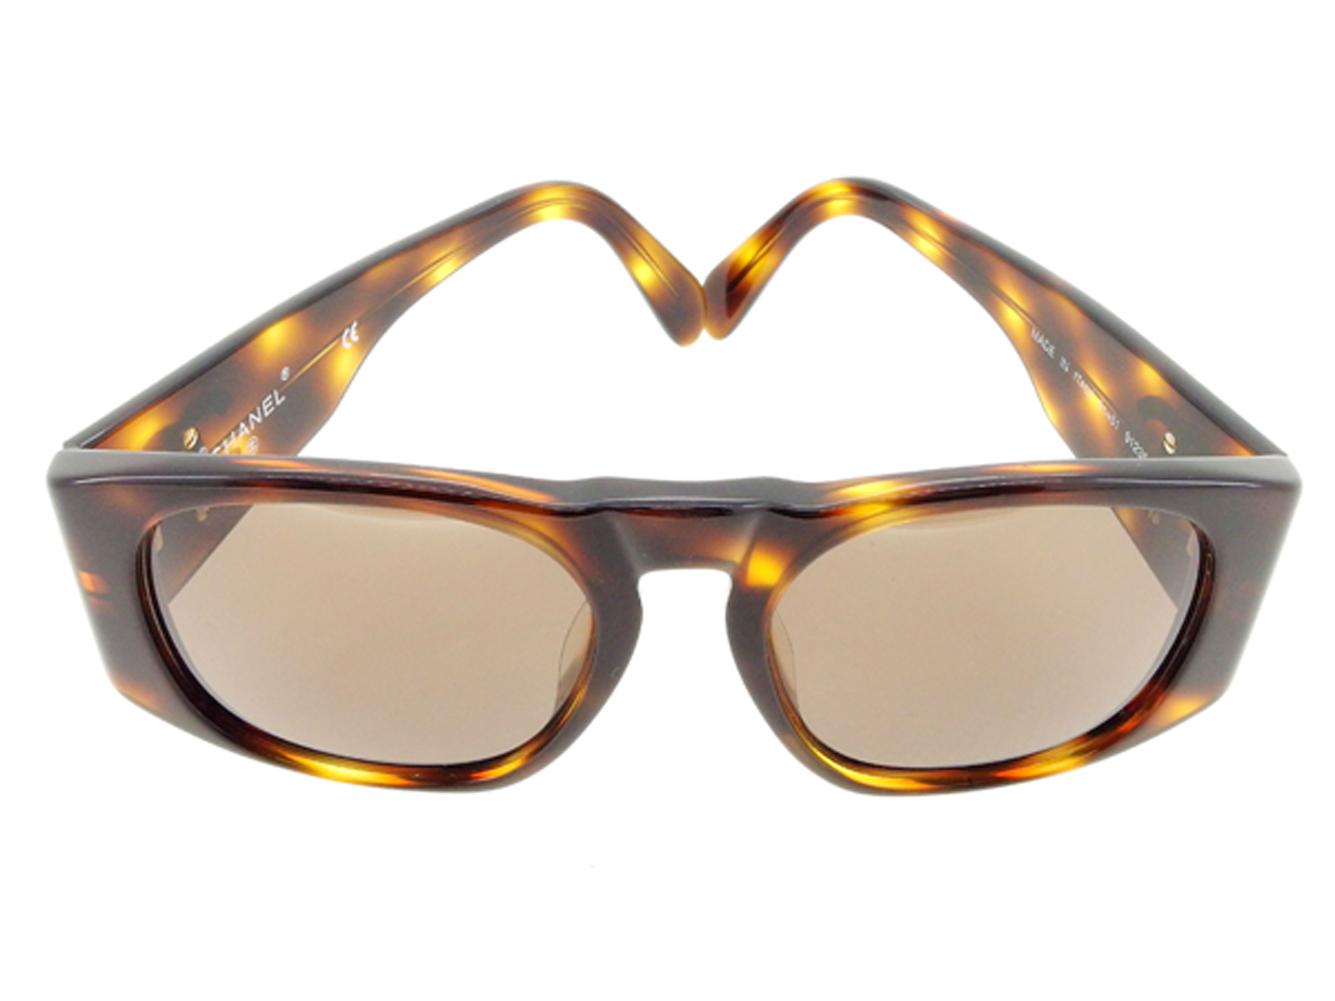 19026c752a Chanel CHANEL sunglasses glasses eyewear girls Boys possible フルリムココマークキッズ  tortoiseshell pattern brown beige gold plastic X gold metal fittings ...